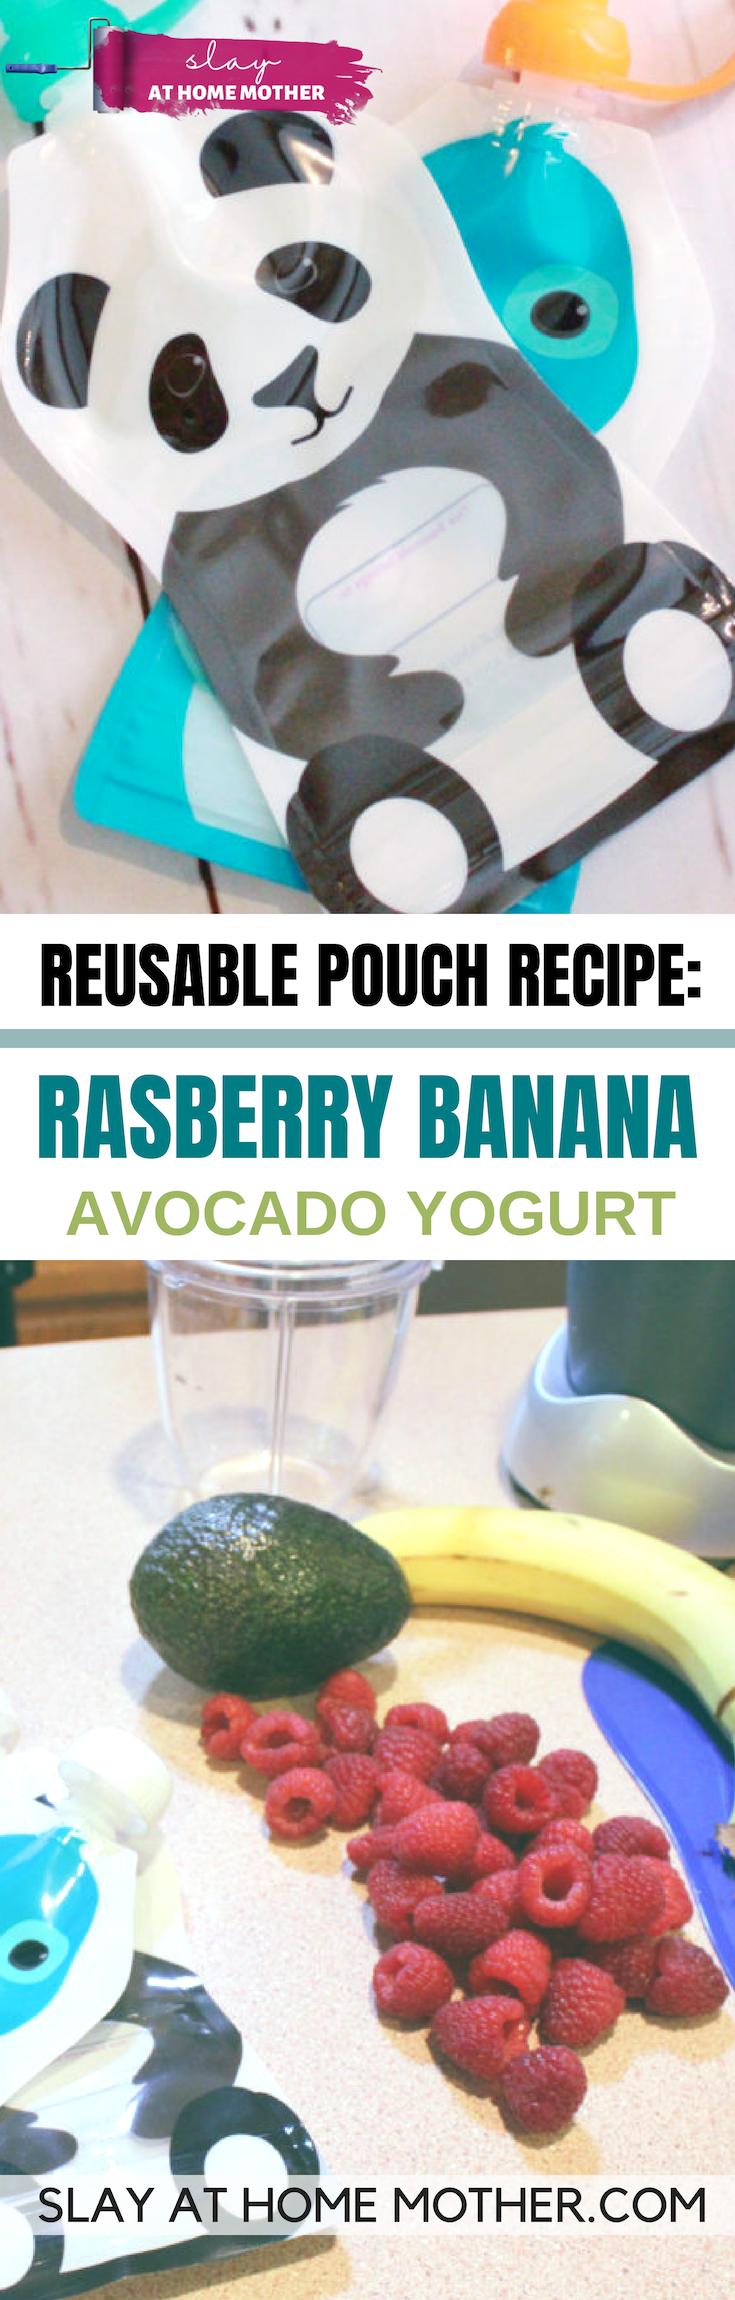 Raspberry Banana Avocado Yogurt Pouch Recipe #babyfood #reusablepouches #slayathomemother - SLAYathomemother.com